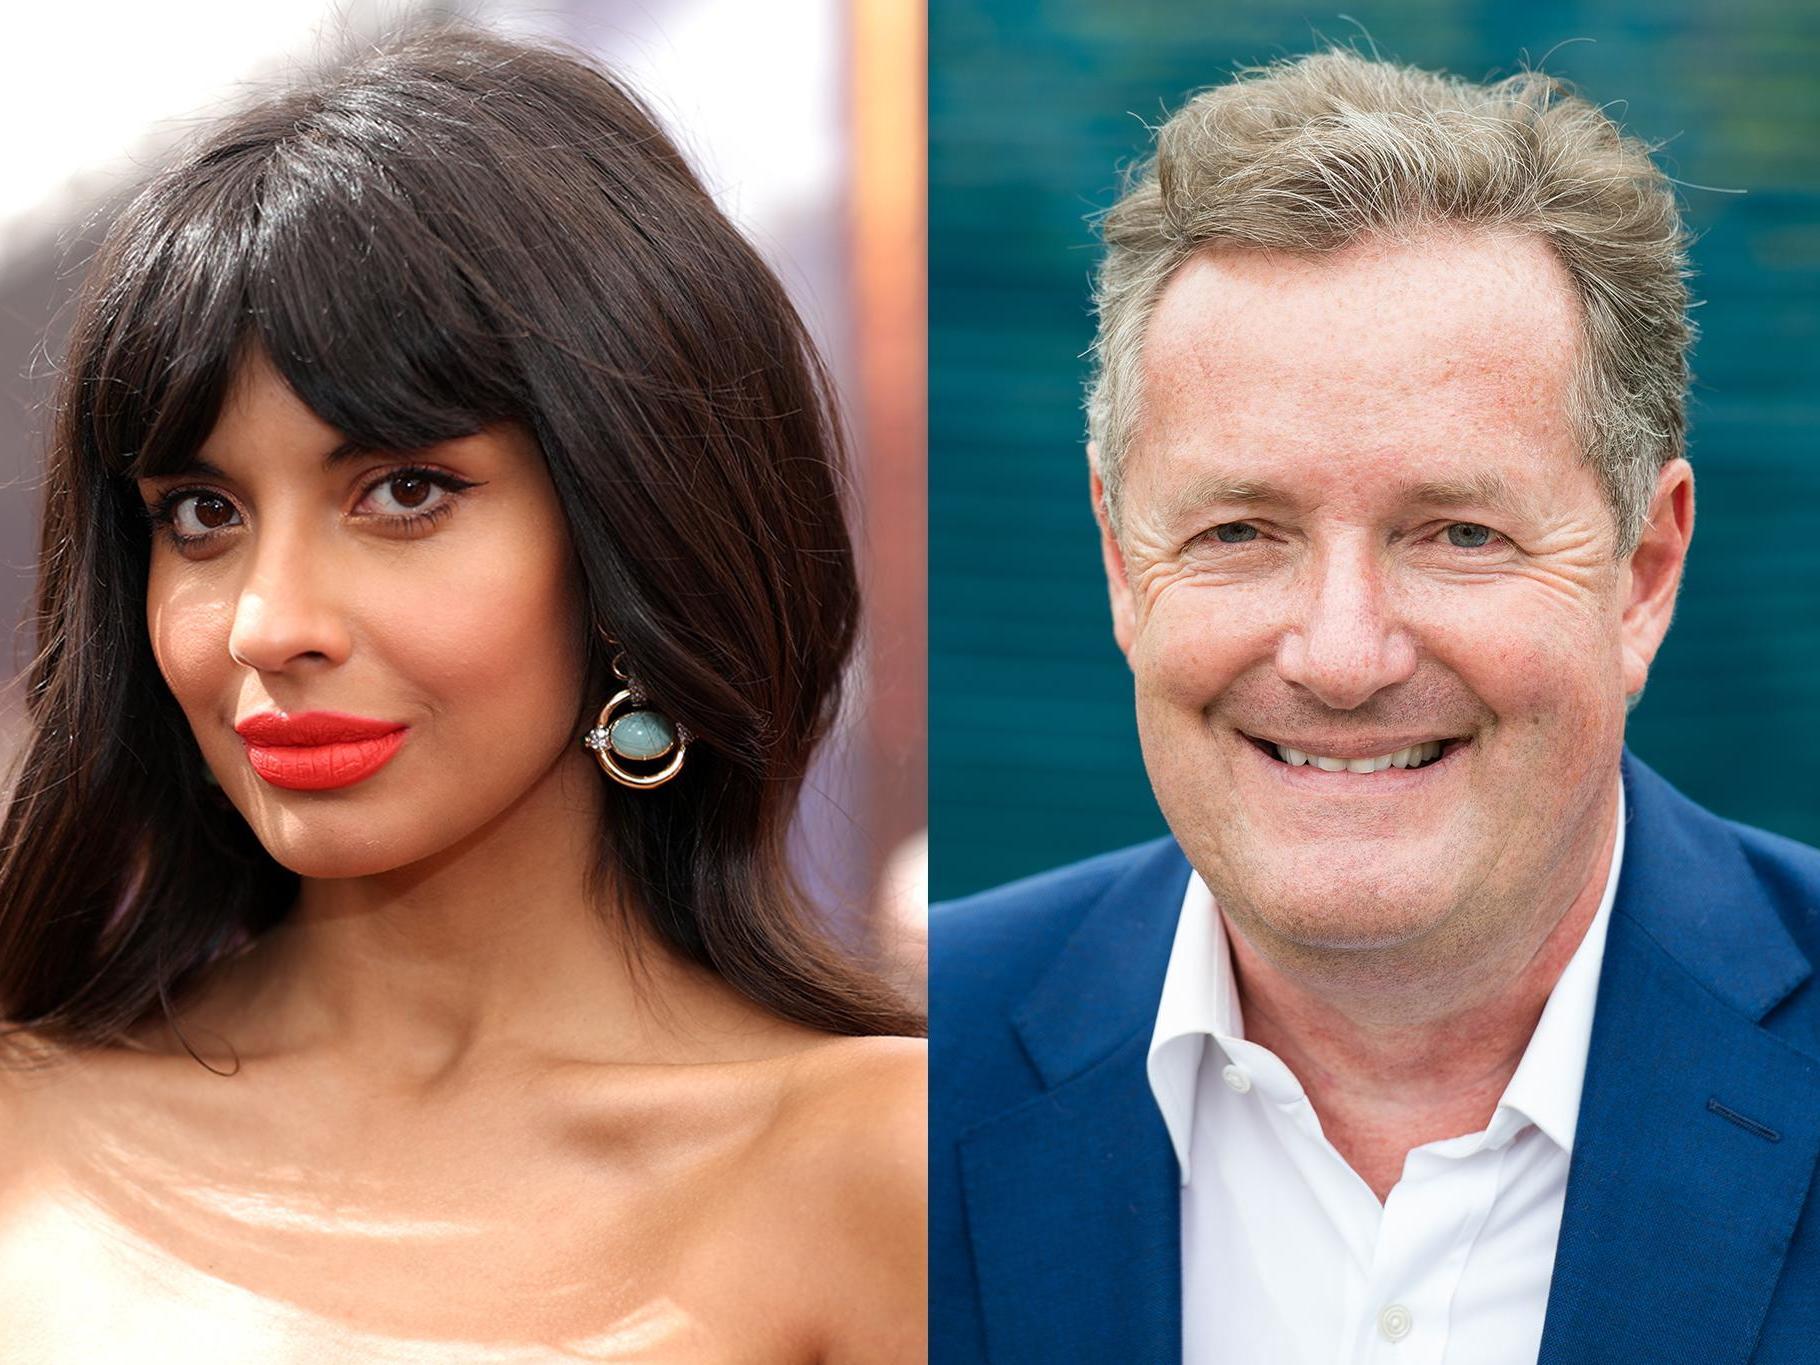 Jameela Jamil calls Piers Morgan 'bullying parasite' for sharing private Caroline Flack messages